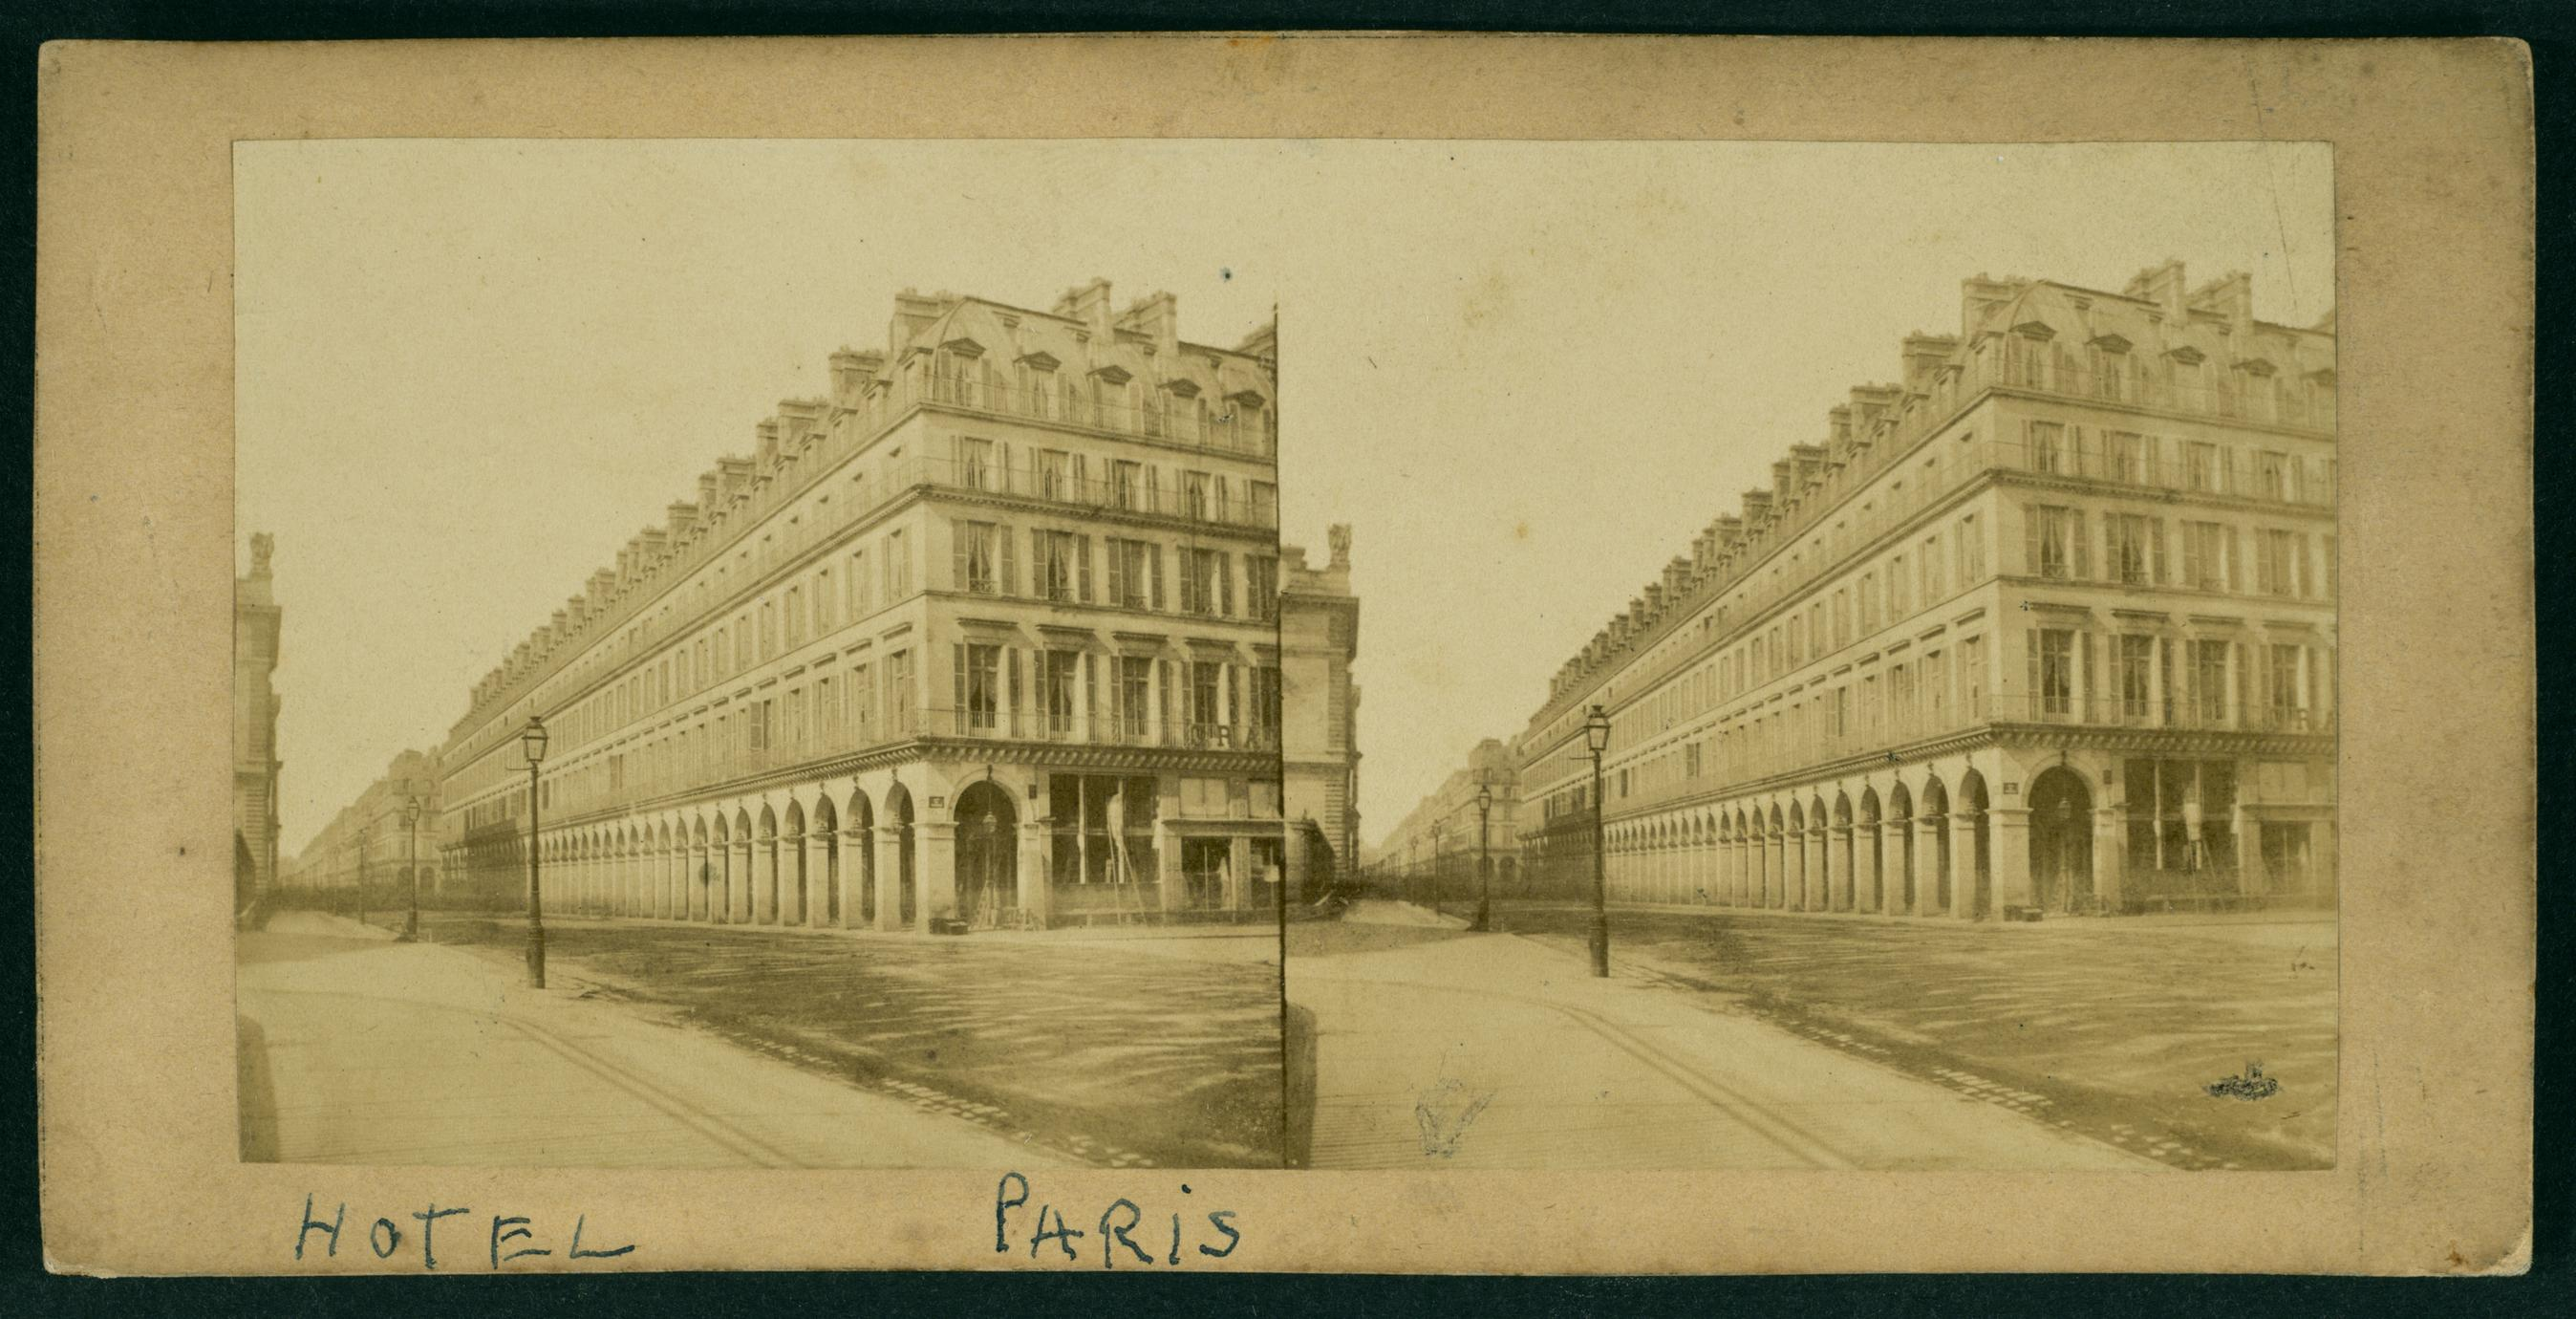 Hotel du Louvre, Rue Rivoli 168, Paris (1 of 2)